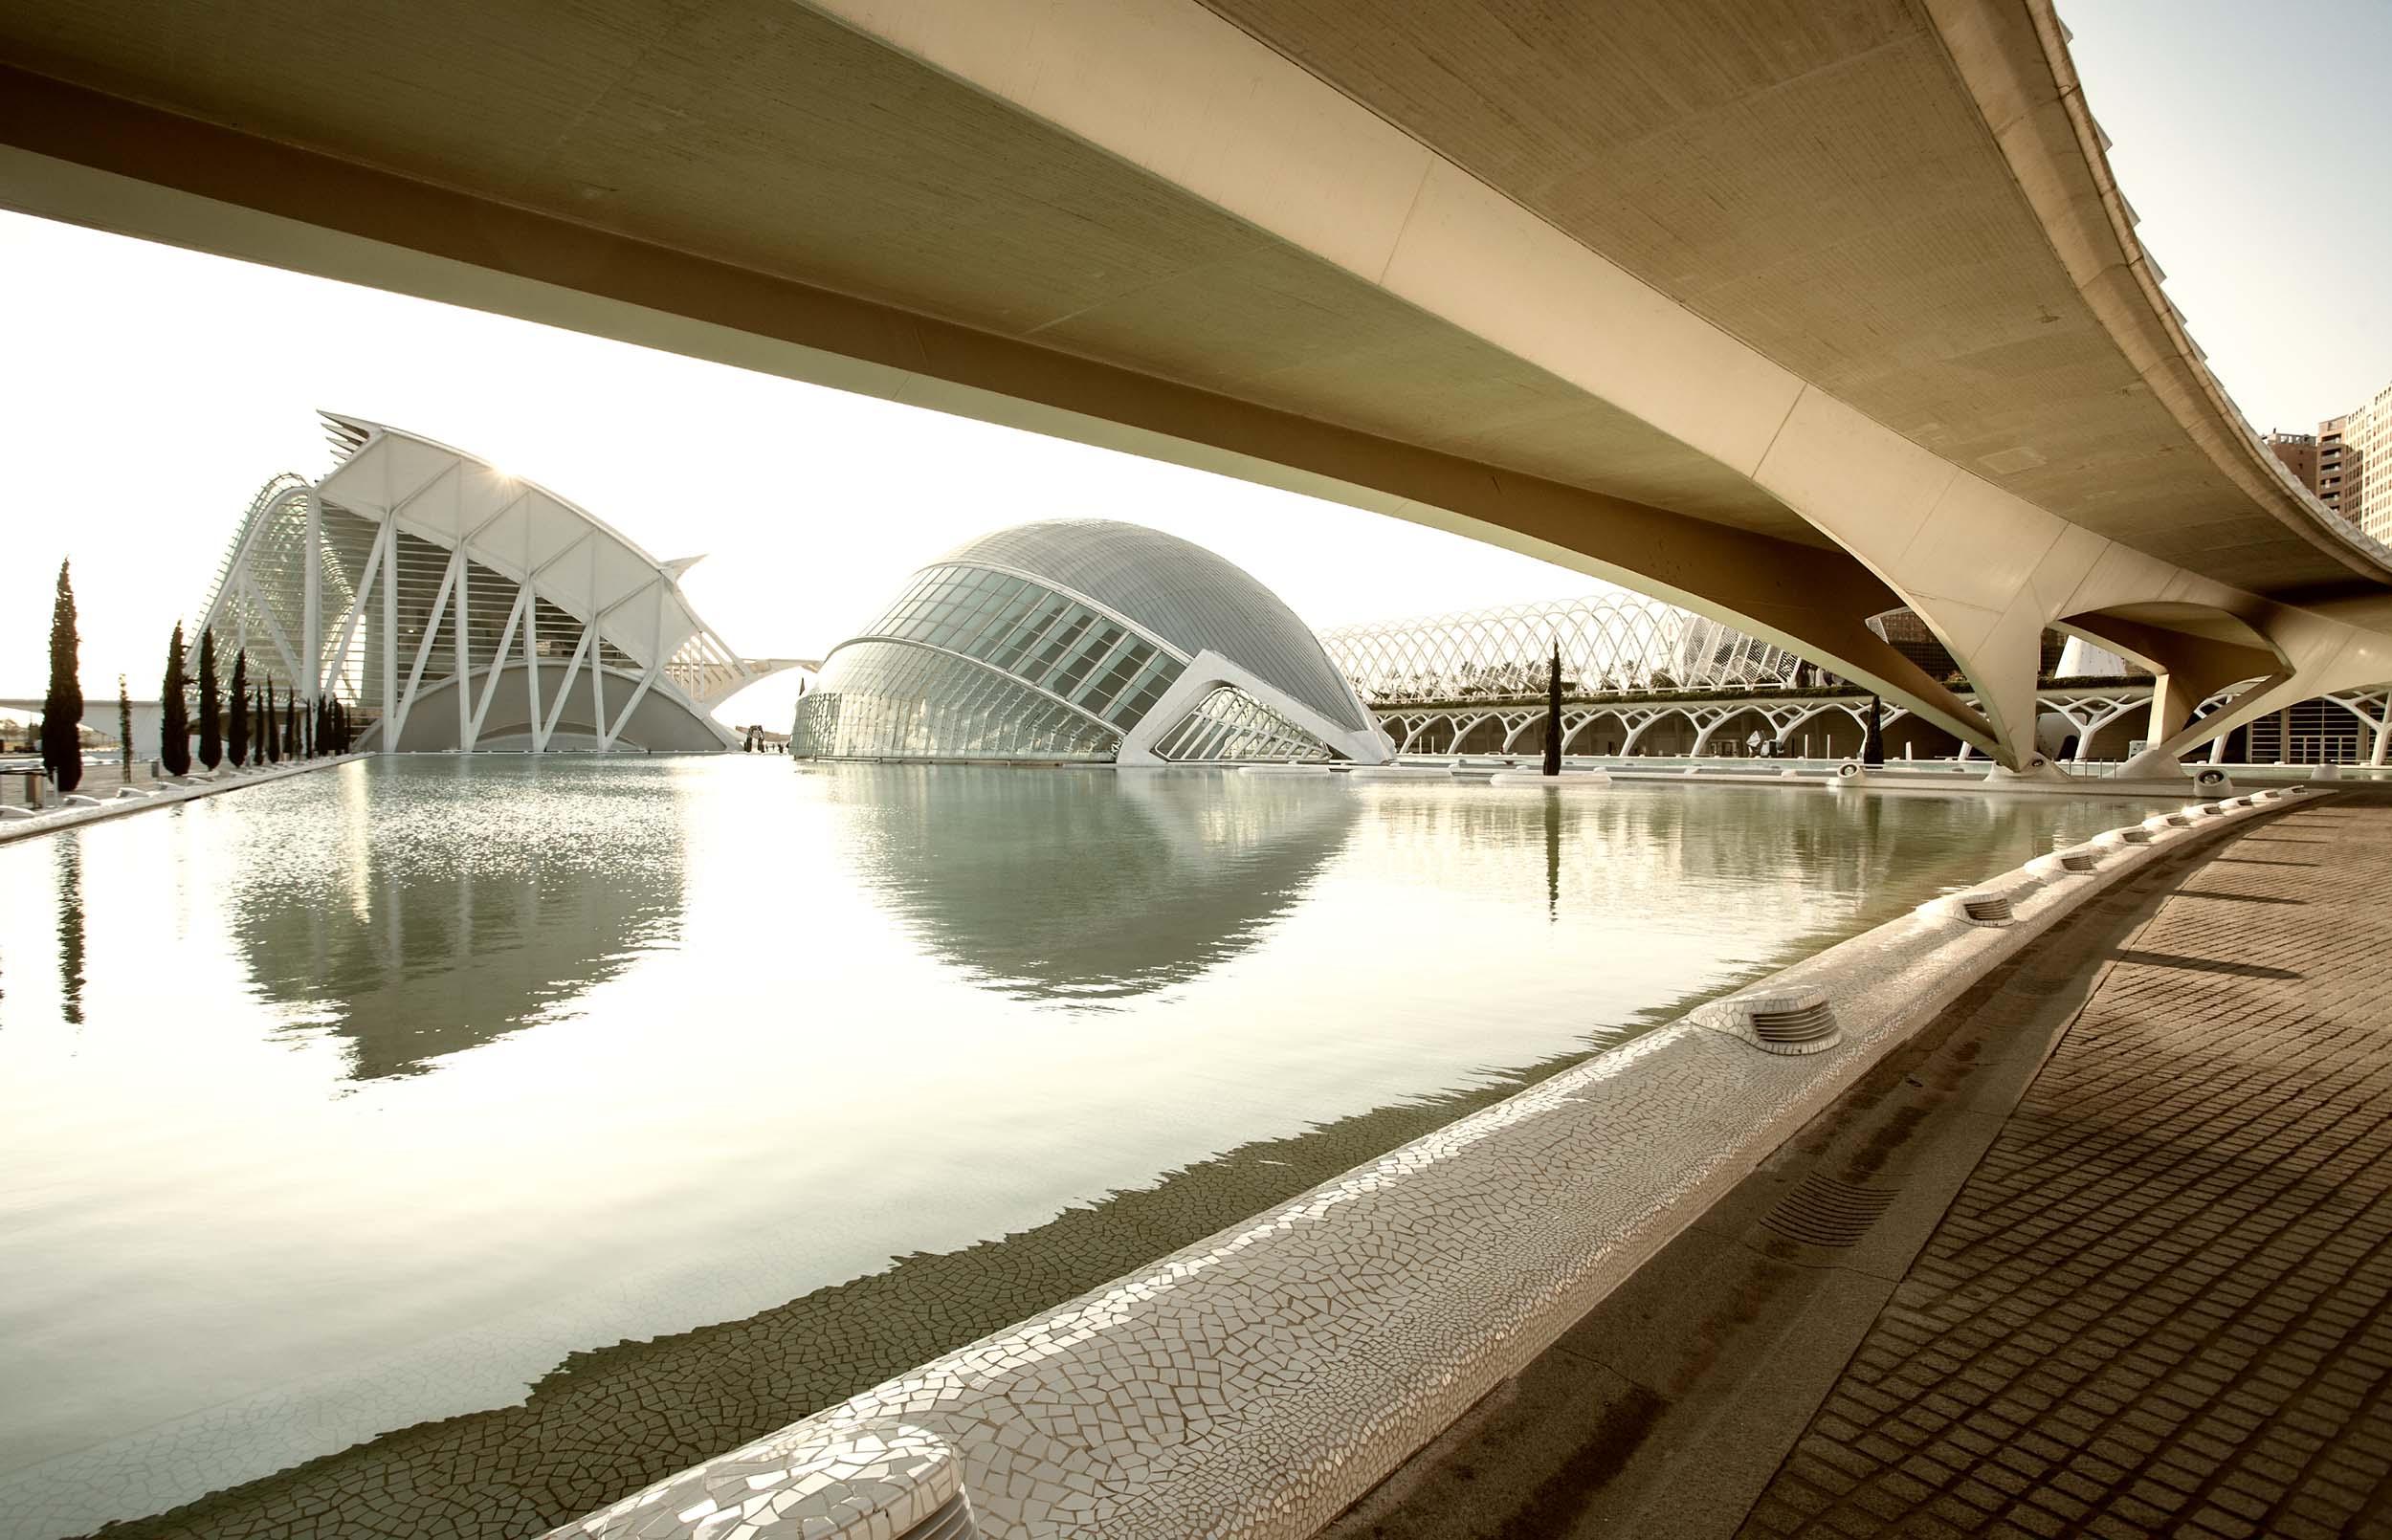 calatrava_city_of_science_scrsh7433_2500_492K.jpg